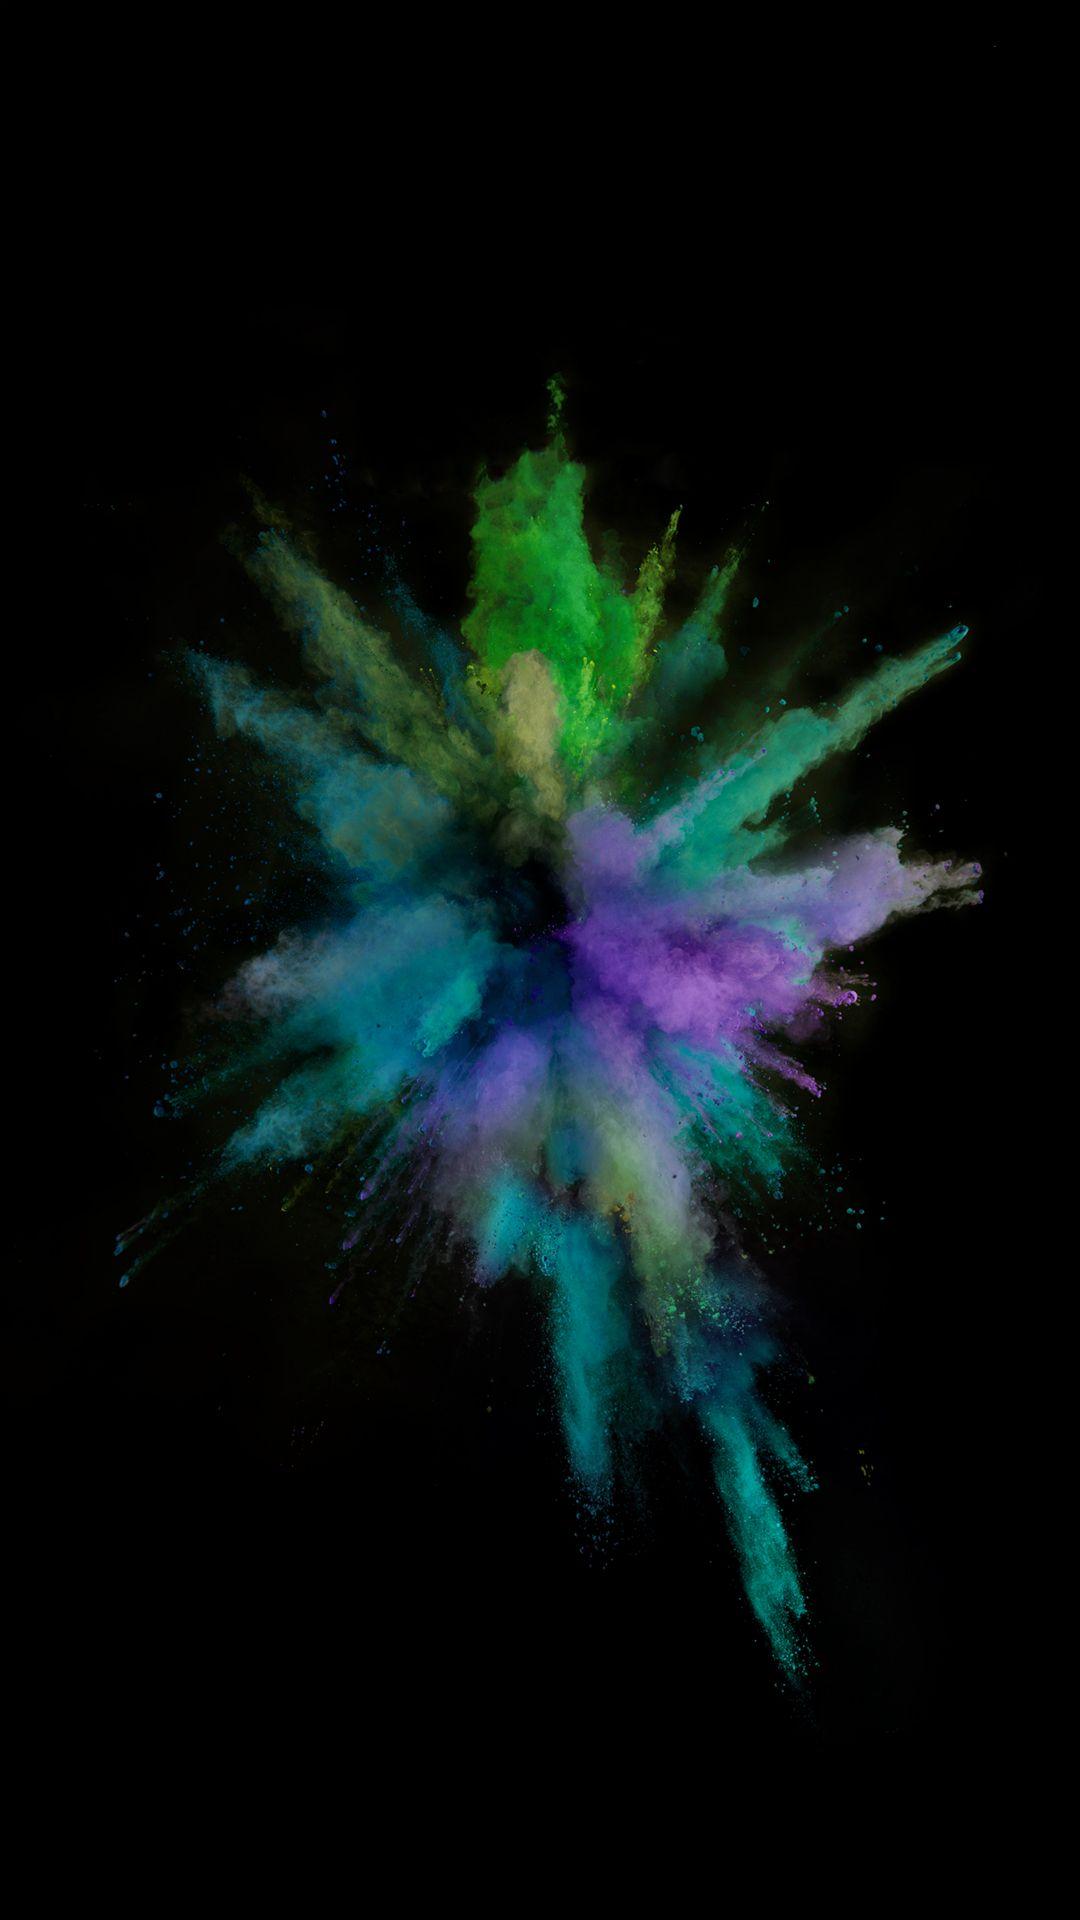 ios9 colorful smoke explosion dark art iphone 6 wallpaper